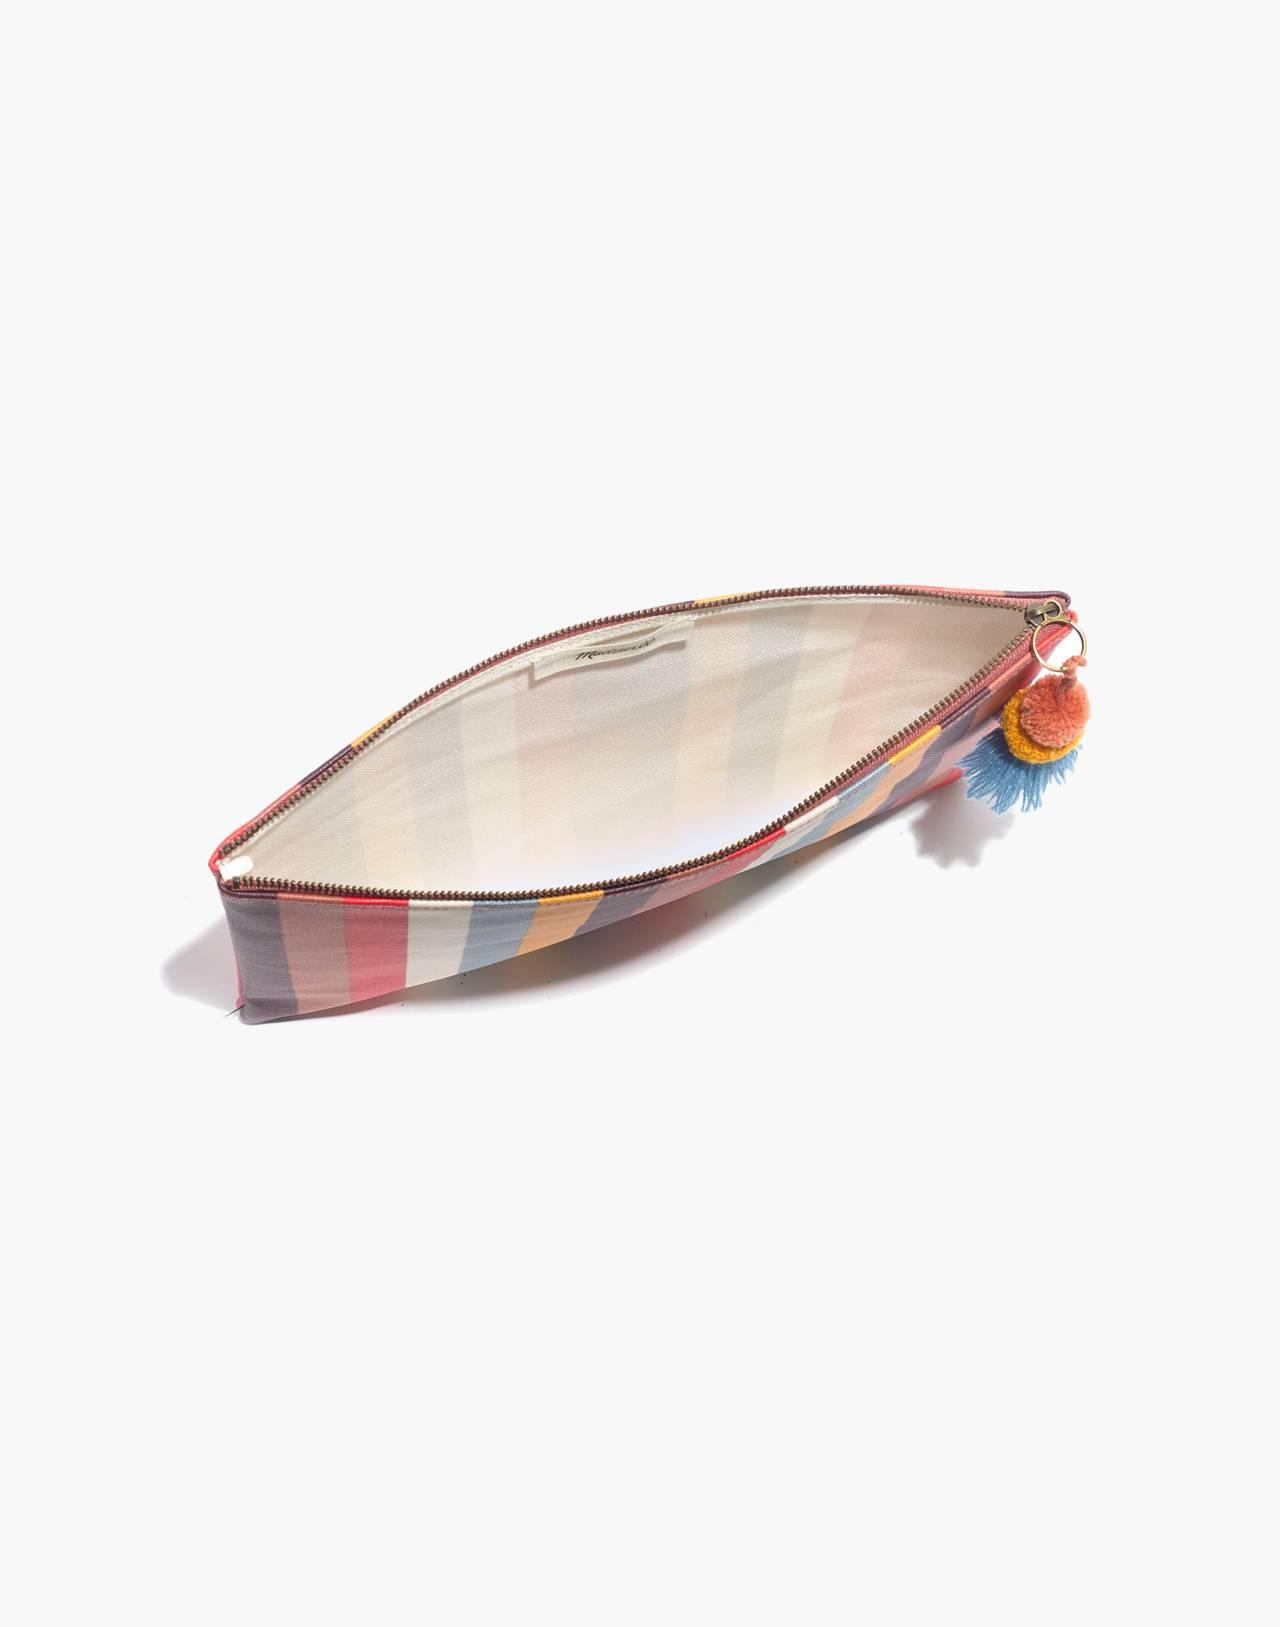 Large Pom-Pom Zip Pouch in Carousel Stripe in sweet dahlia multi image 2